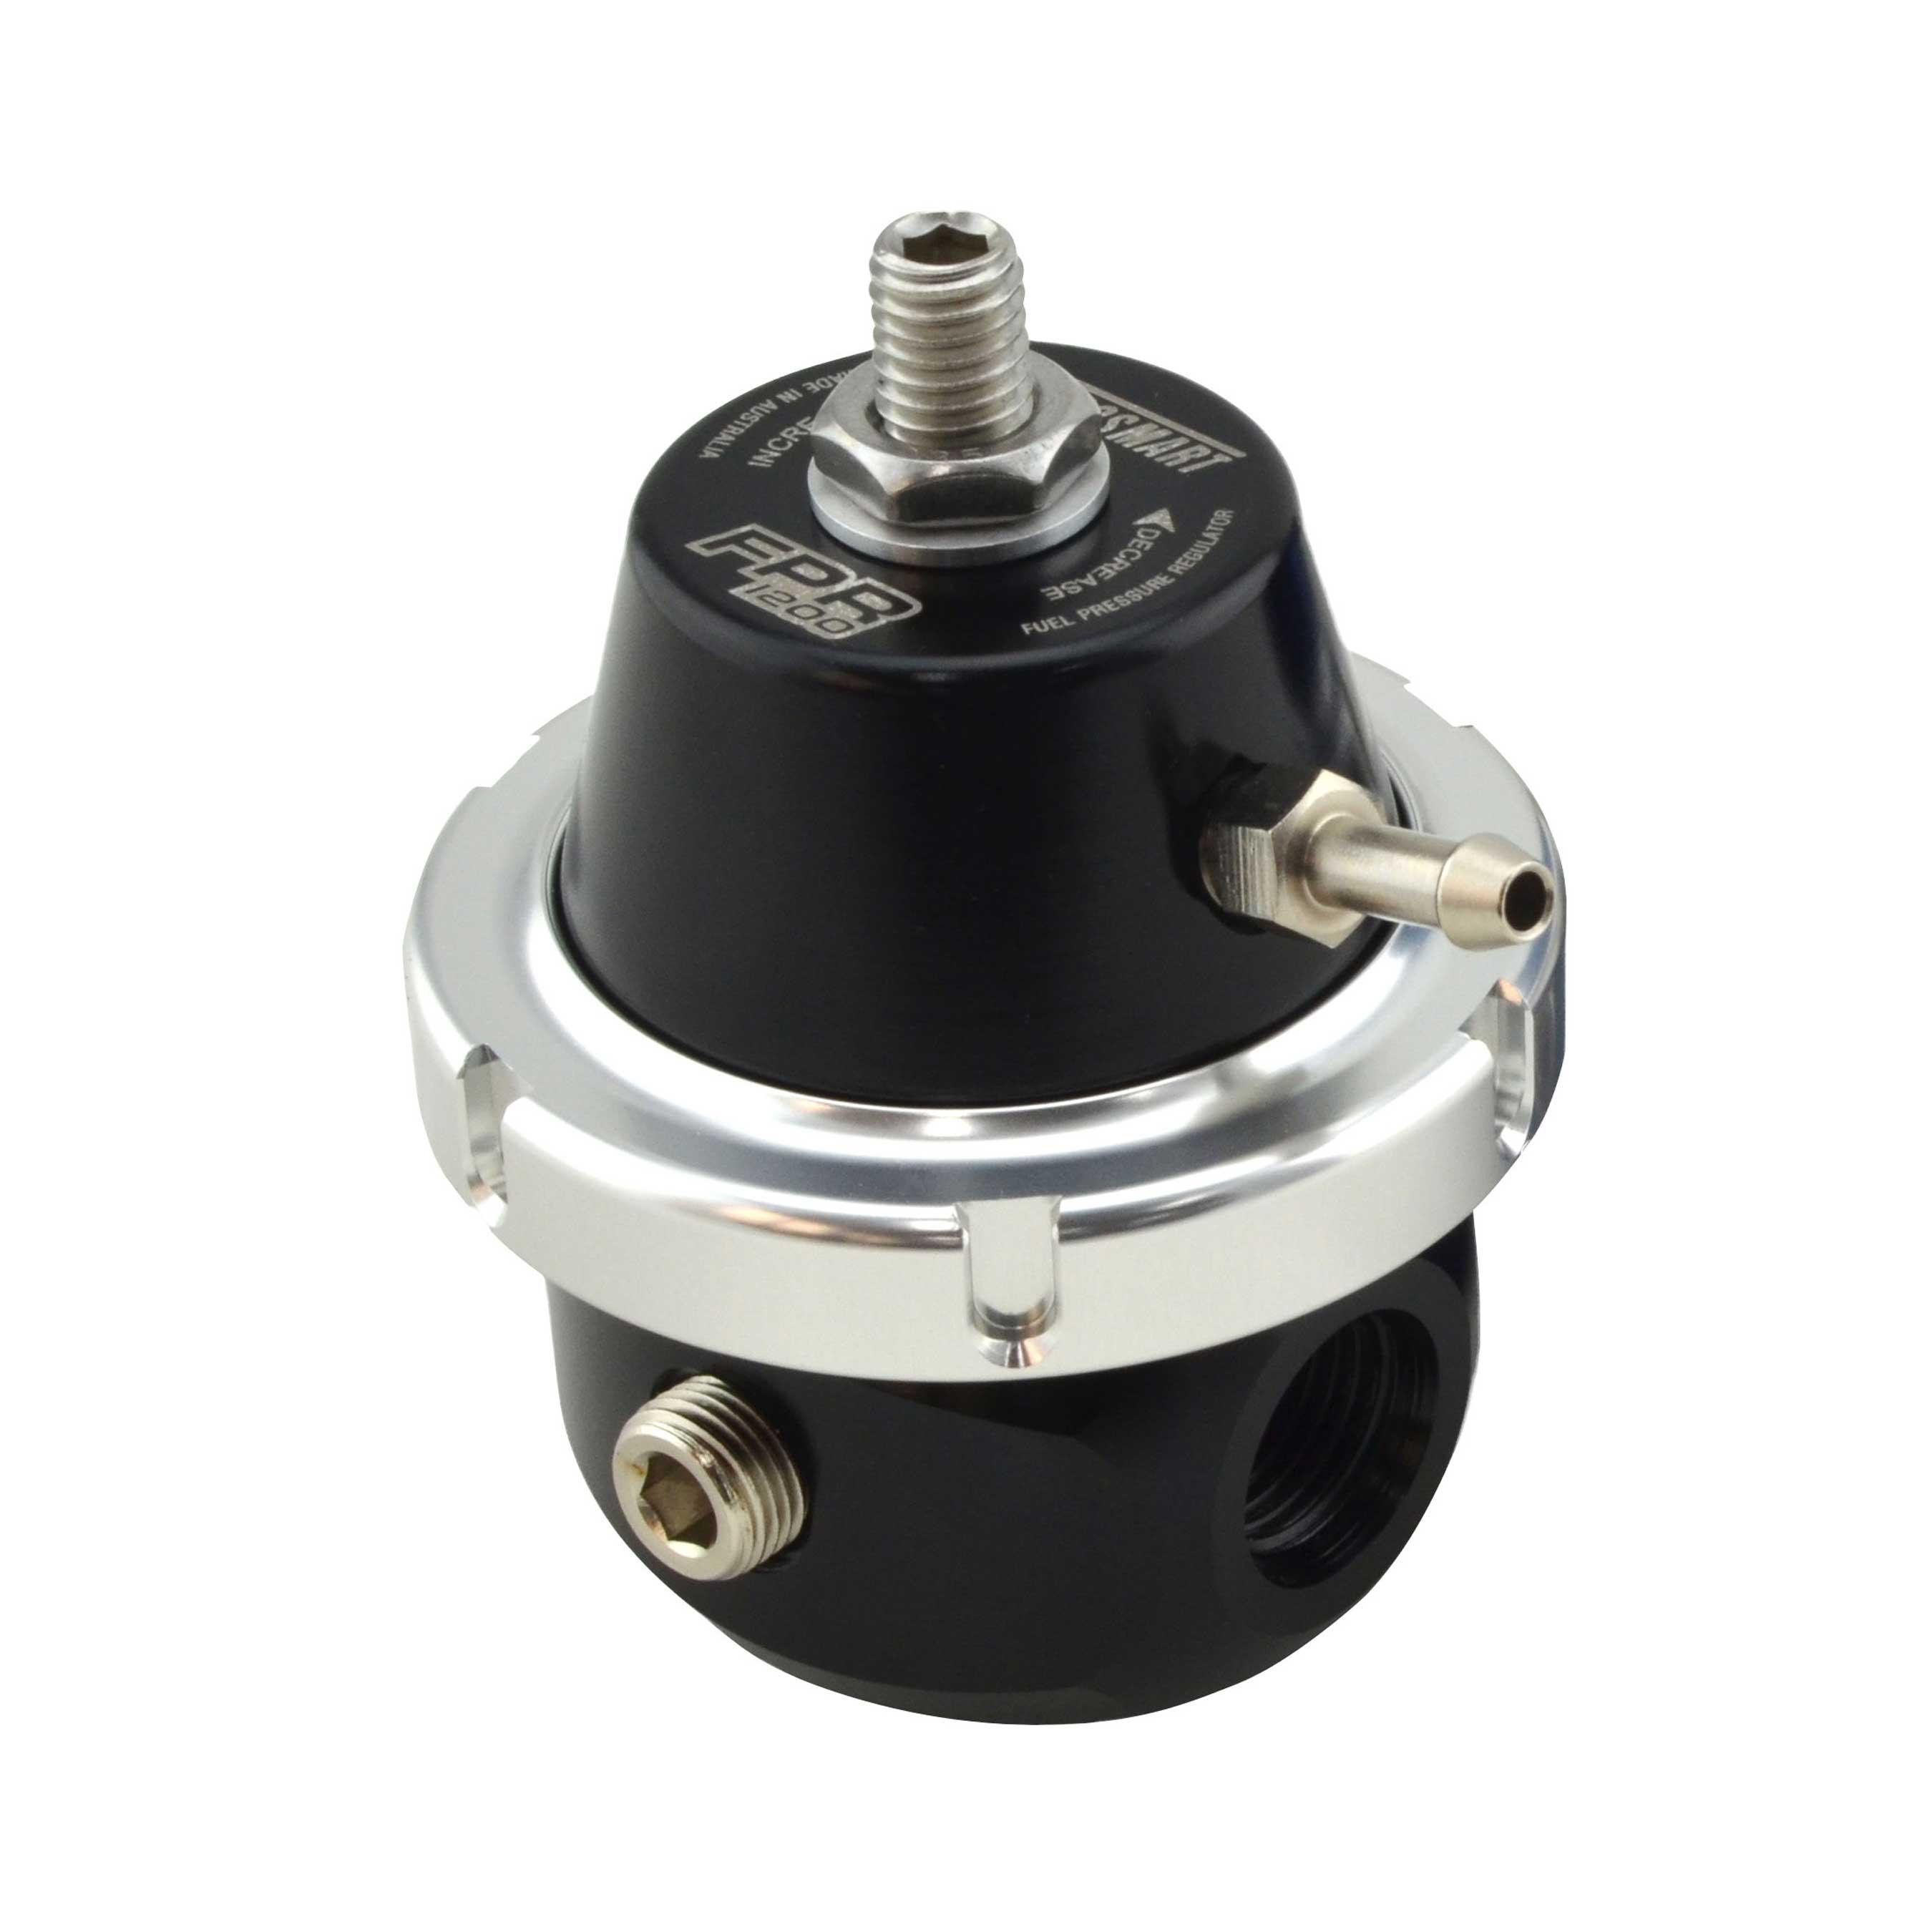 Turbosmart 1200 FPR Black